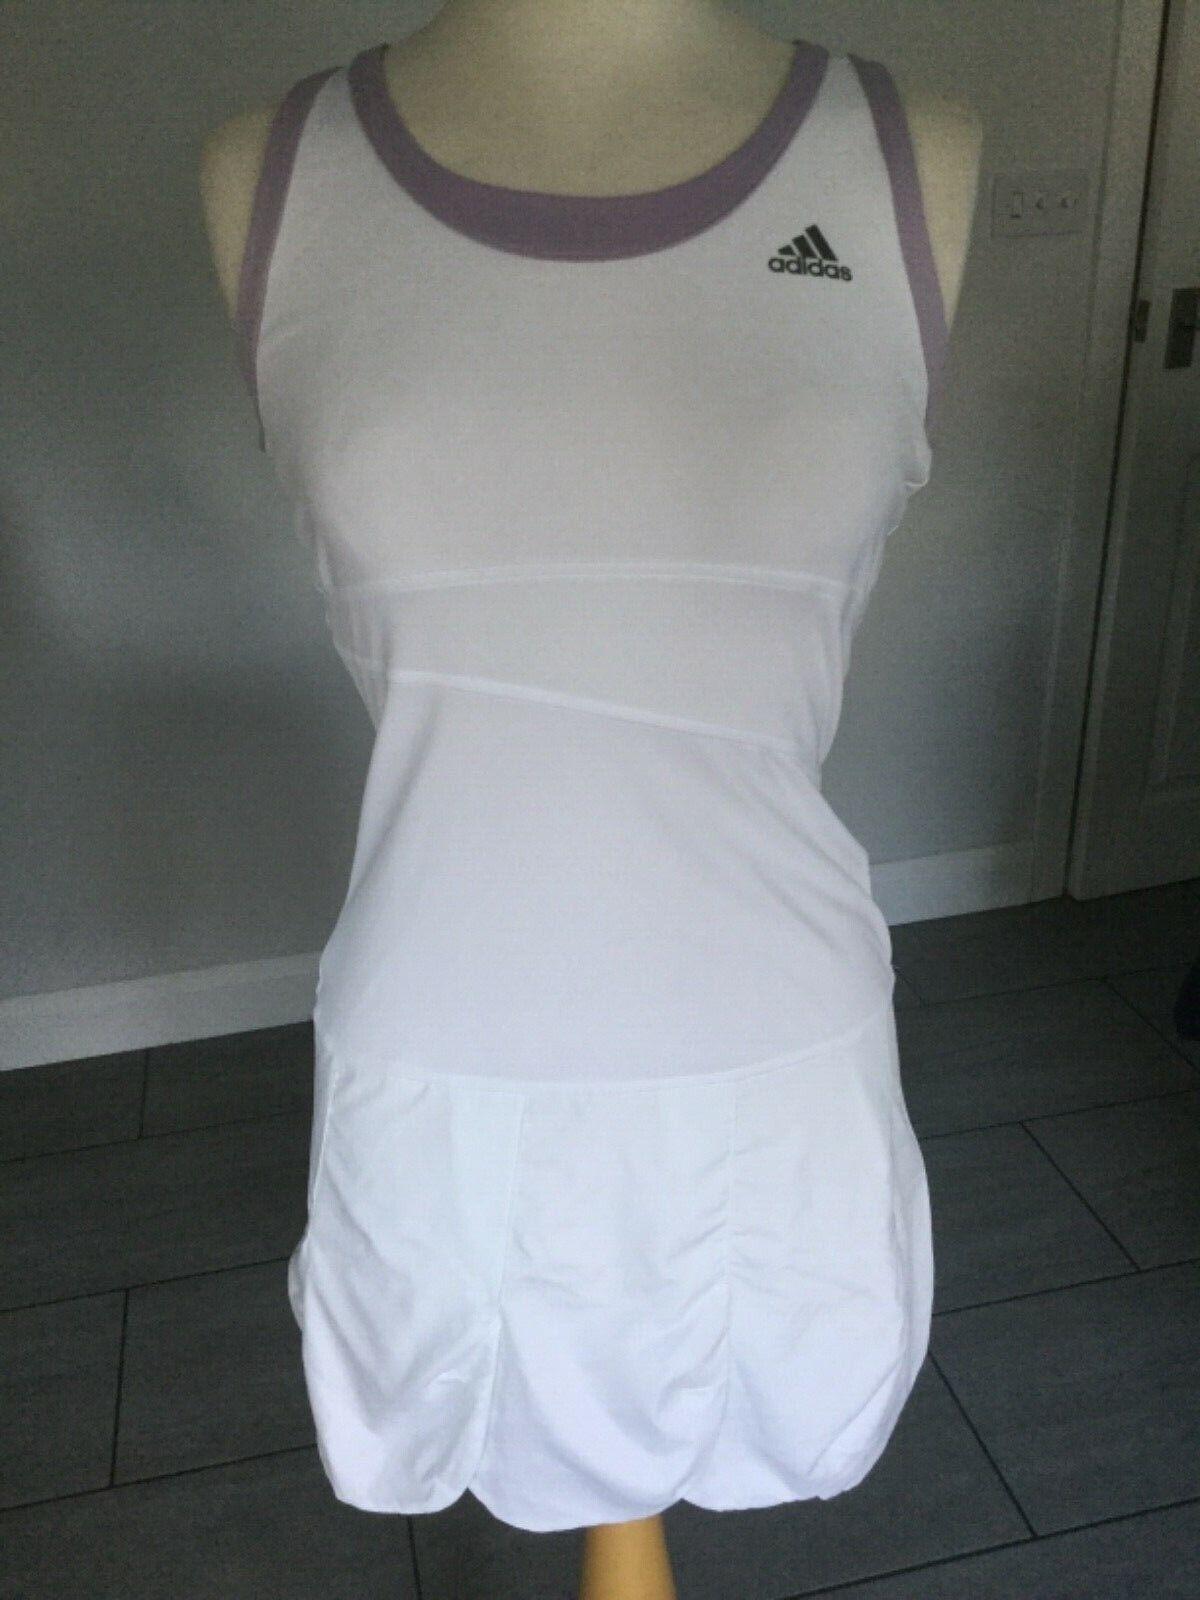 Adidas Performance Women's Sleeveless Tennis Dress Size 10 Clima365 BNWT RRP